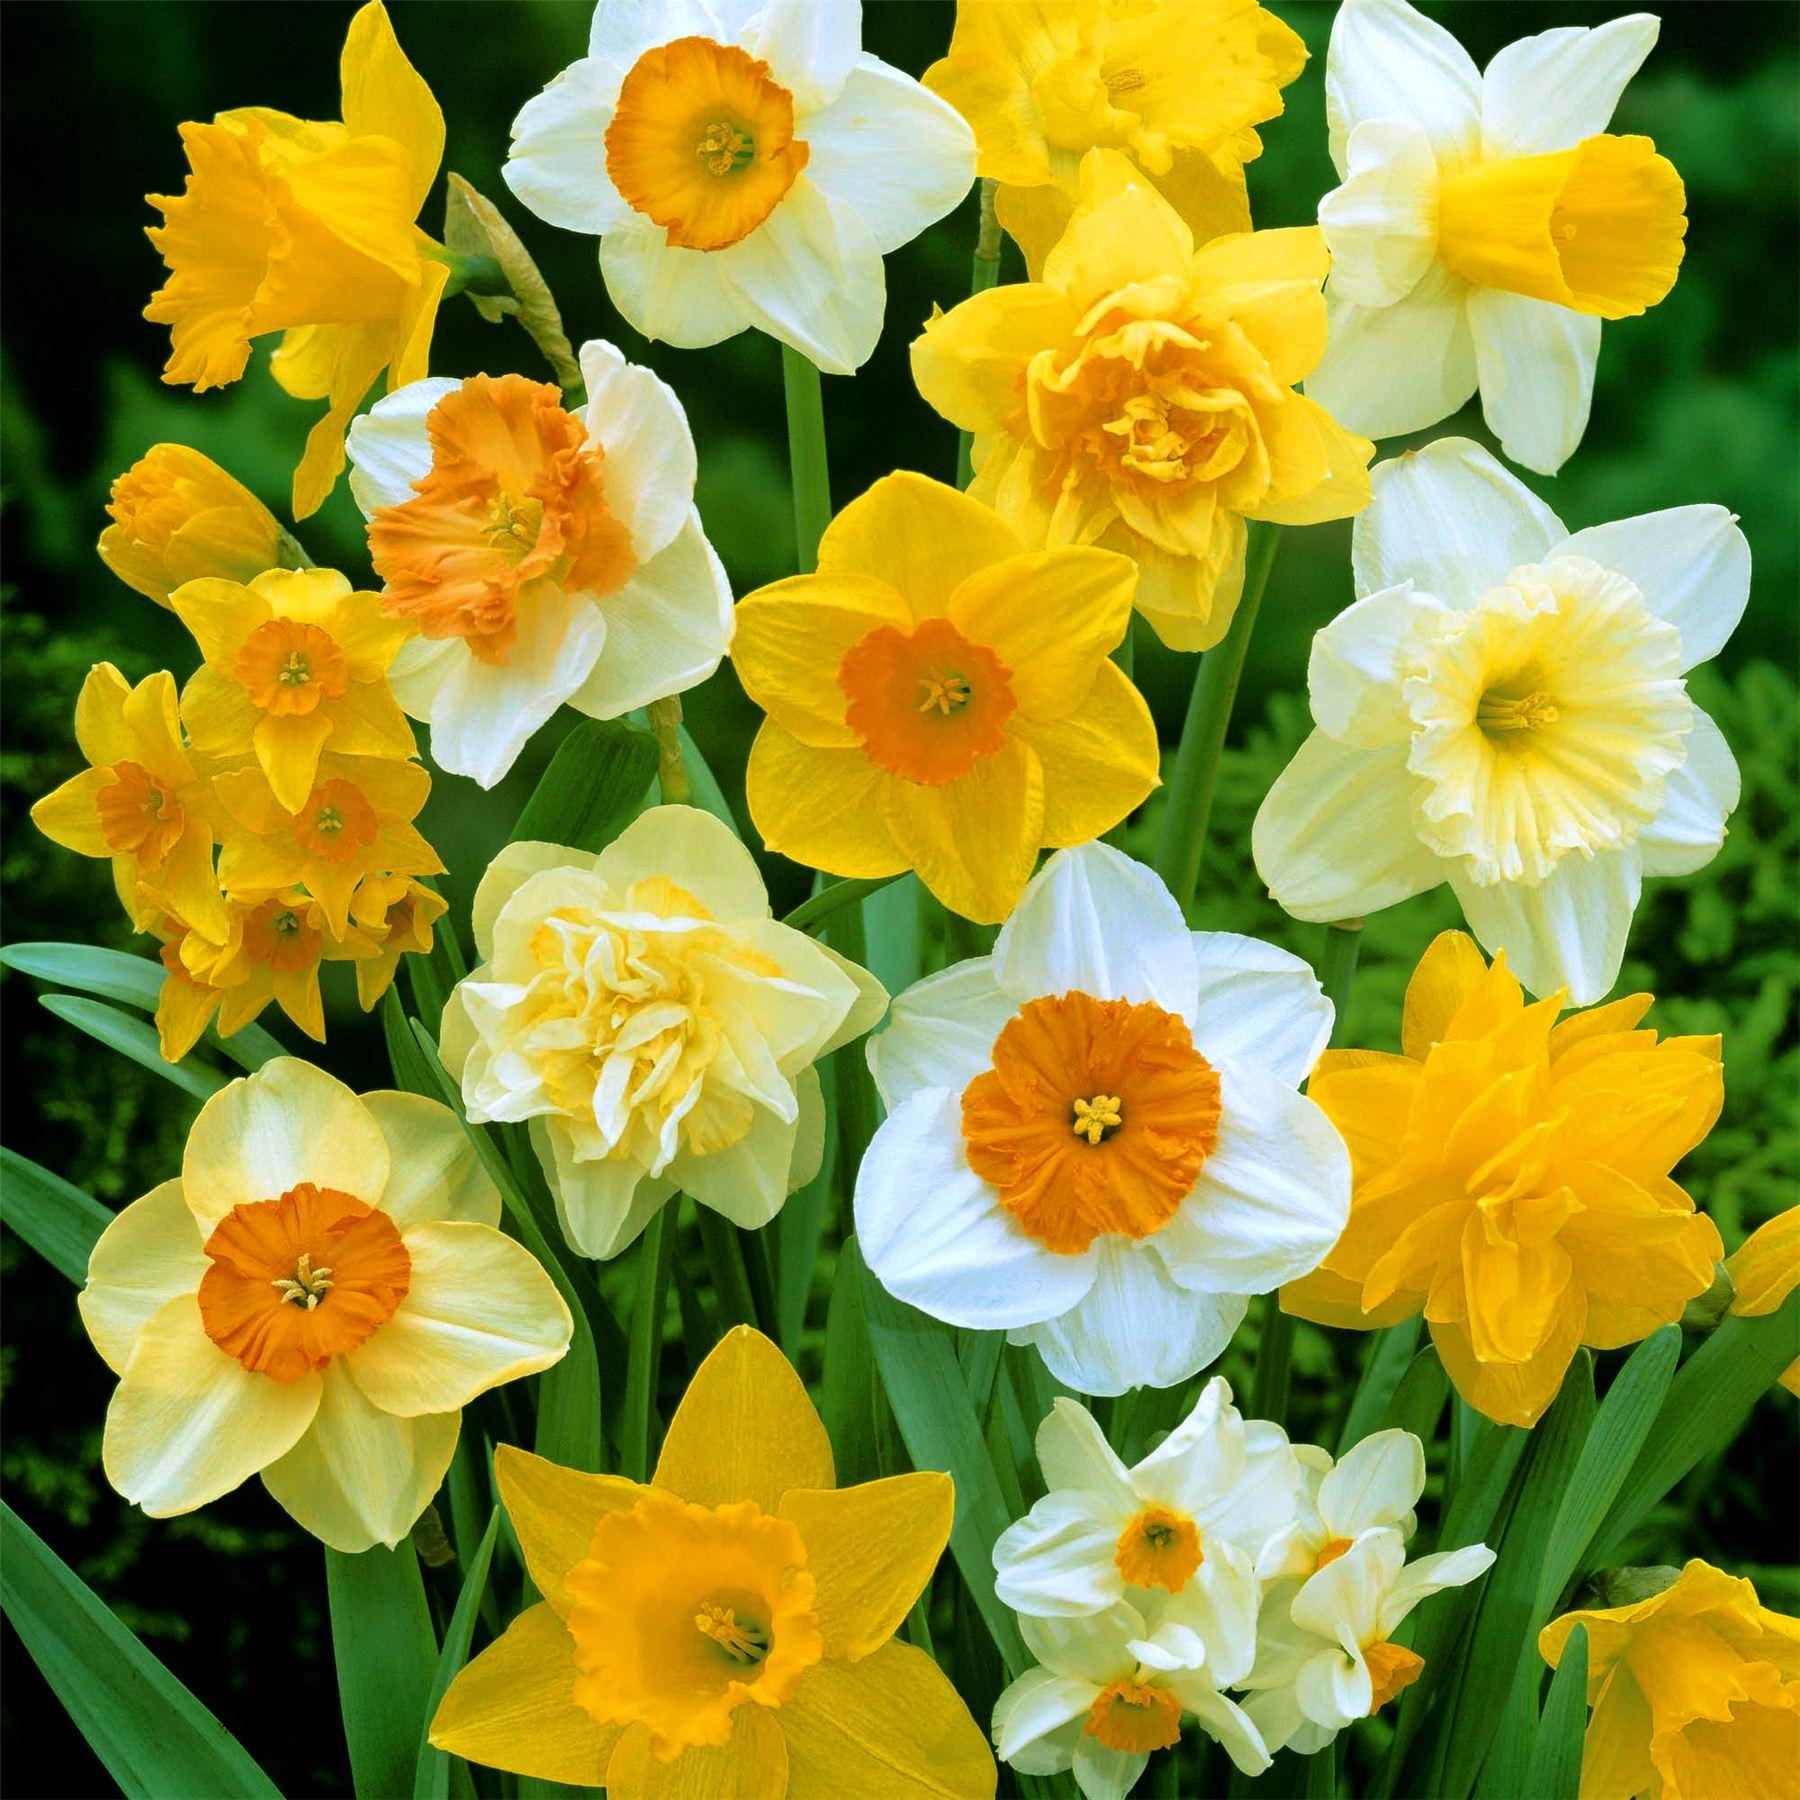 15 Dwarf Daffodil Narcissus Mix Garden Bulb Autumn Growing Spring